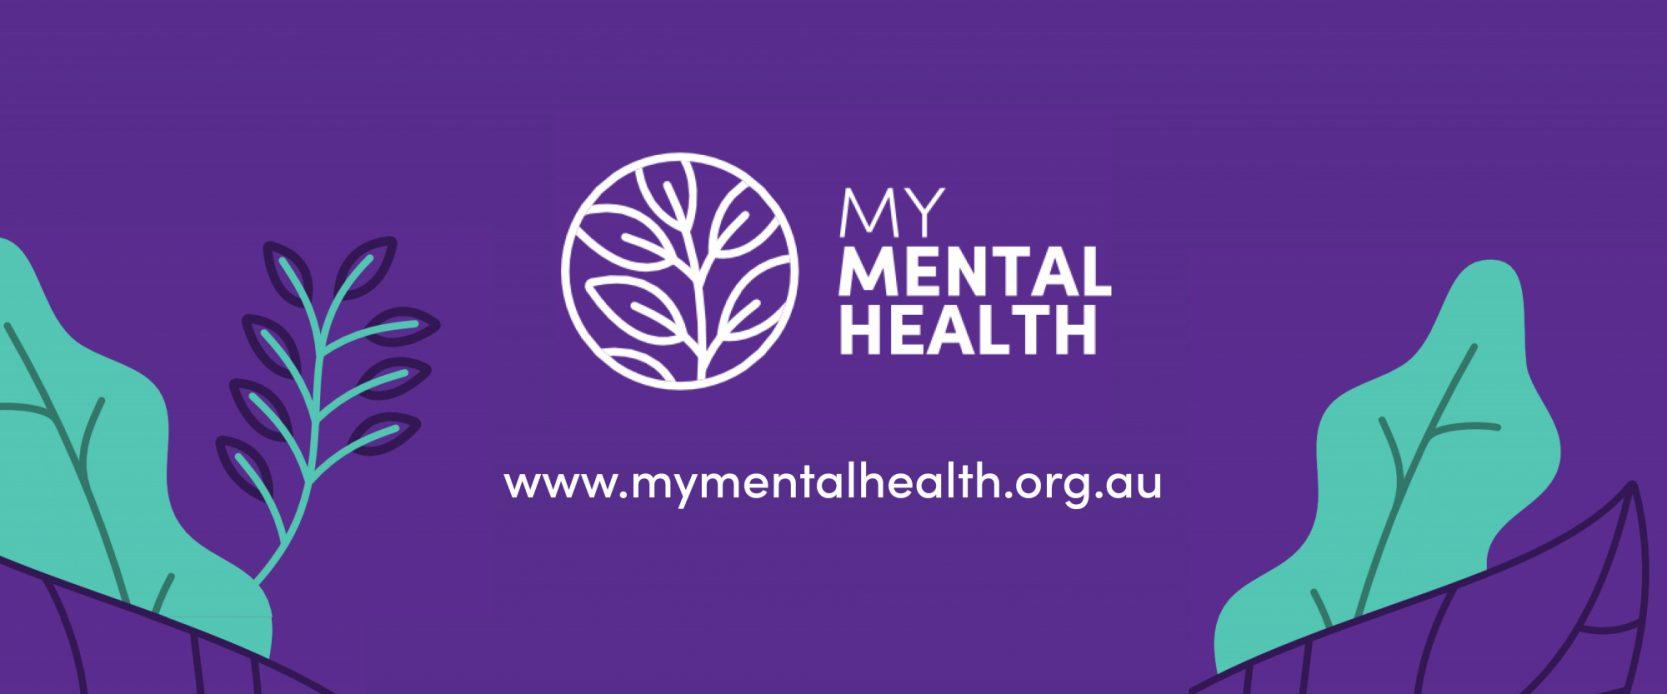 My mental Health social media post banner